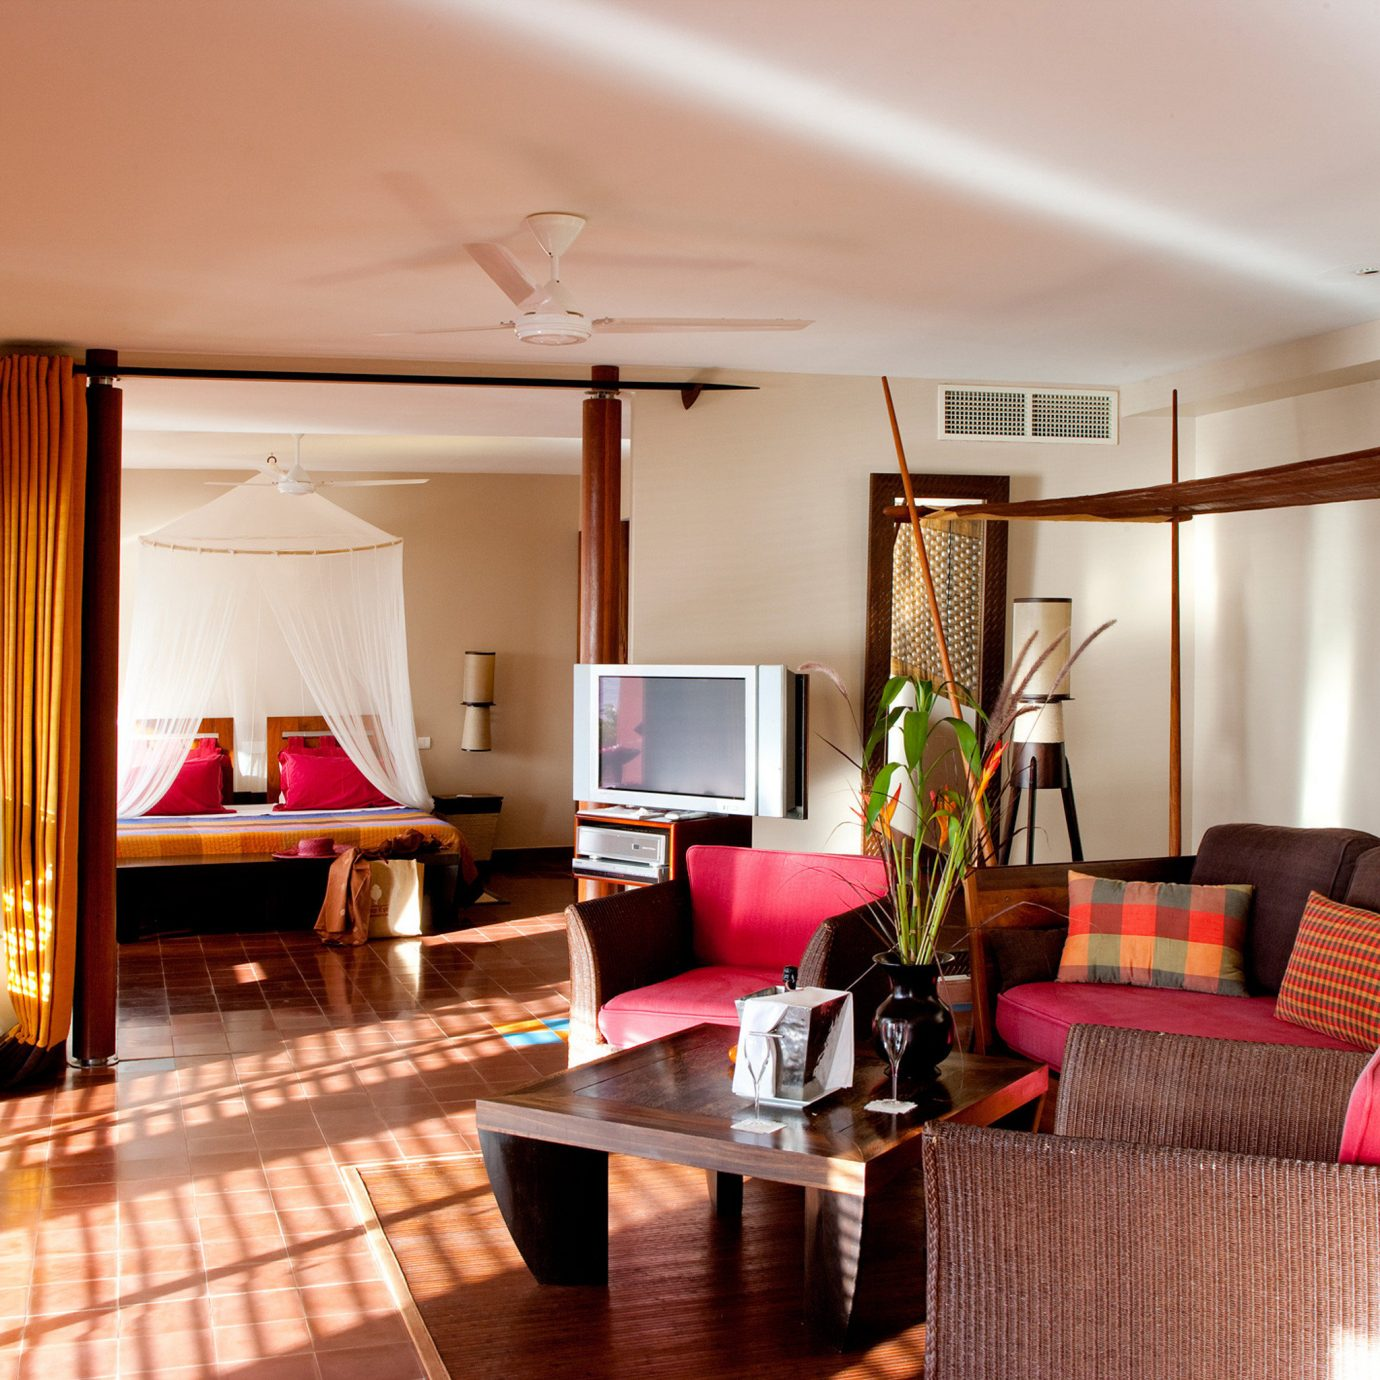 Bedroom Island Luxury Suite property living room condominium home Villa Resort cottage flat leather